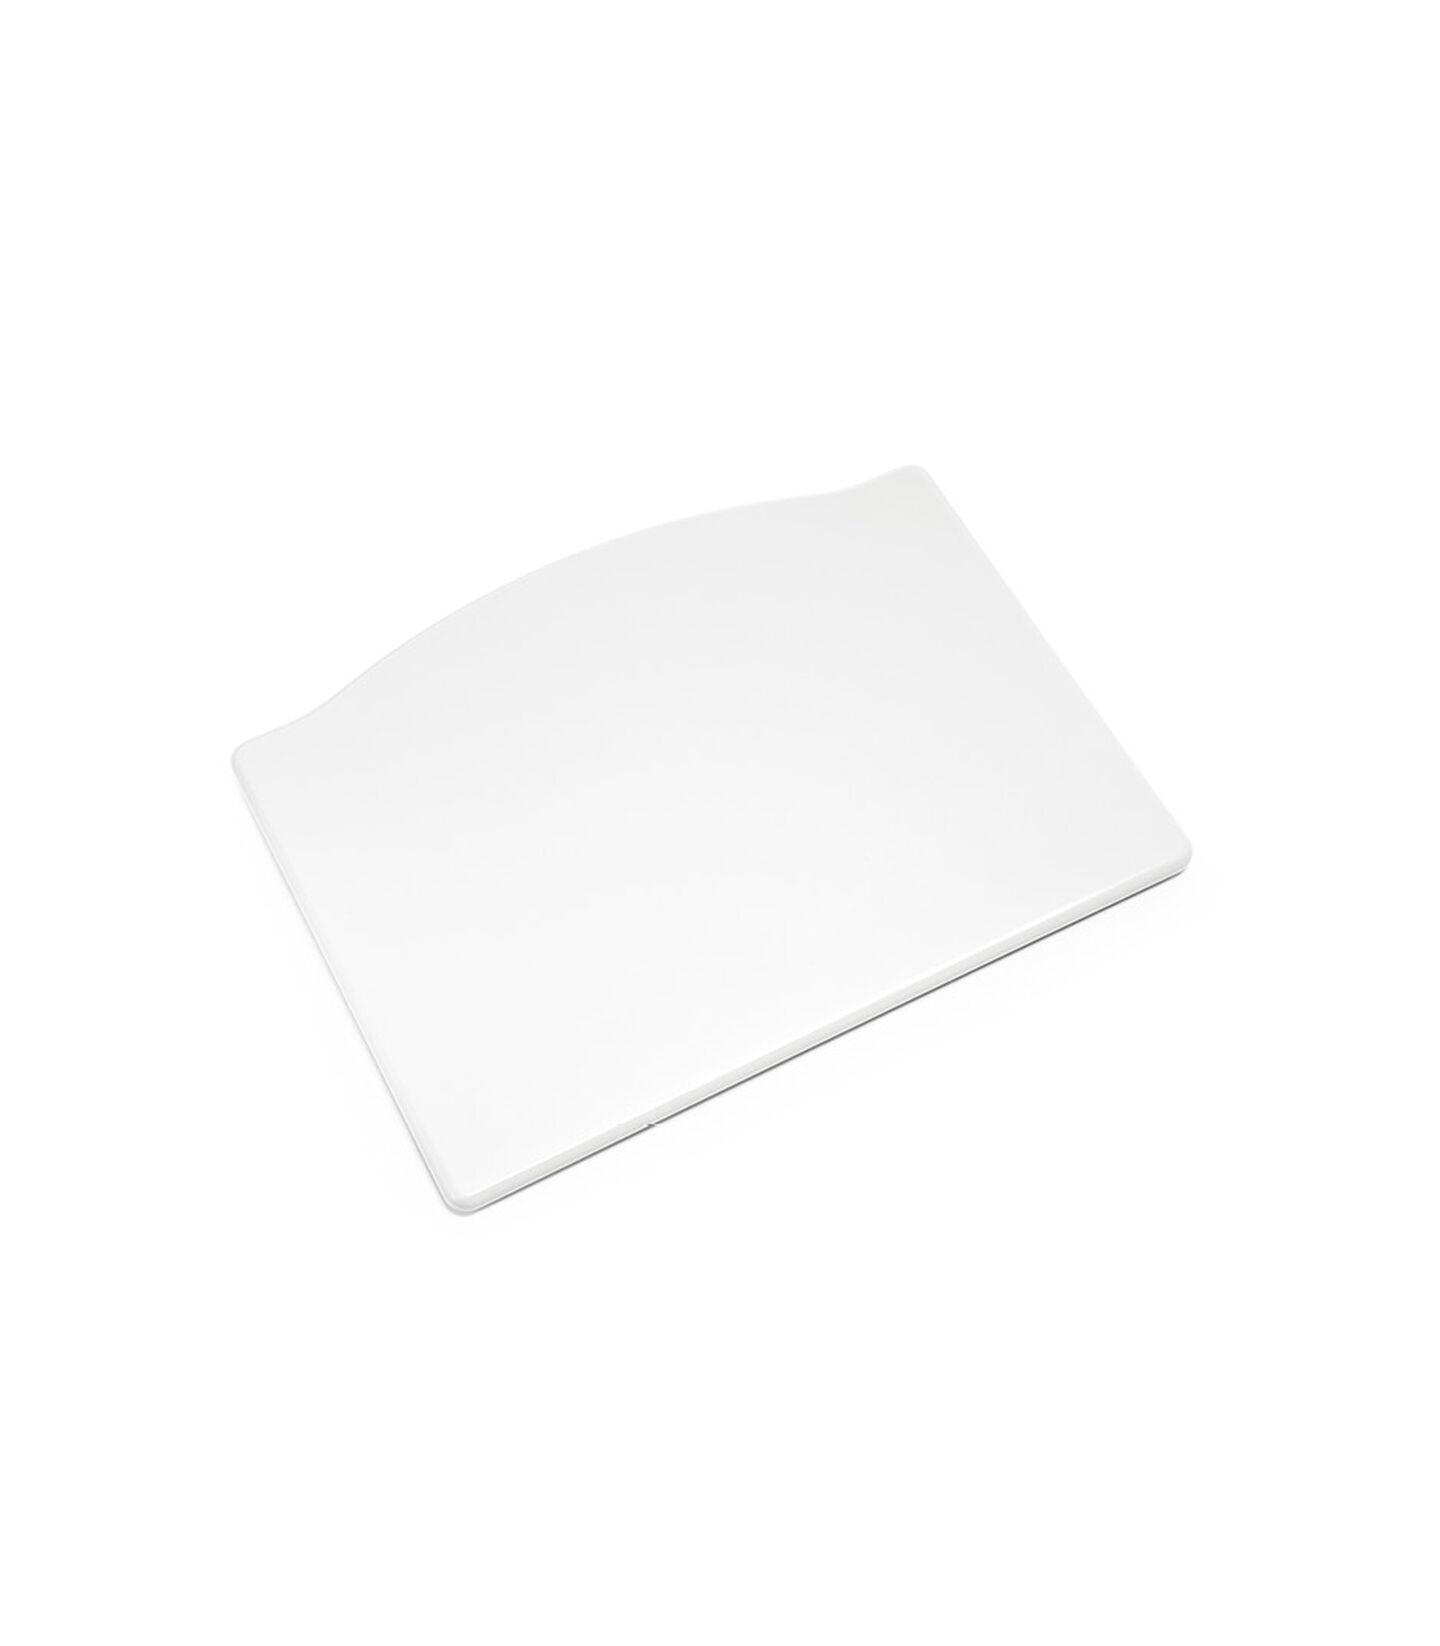 Tripp Trapp® Footplate Bianco, Bianco, mainview